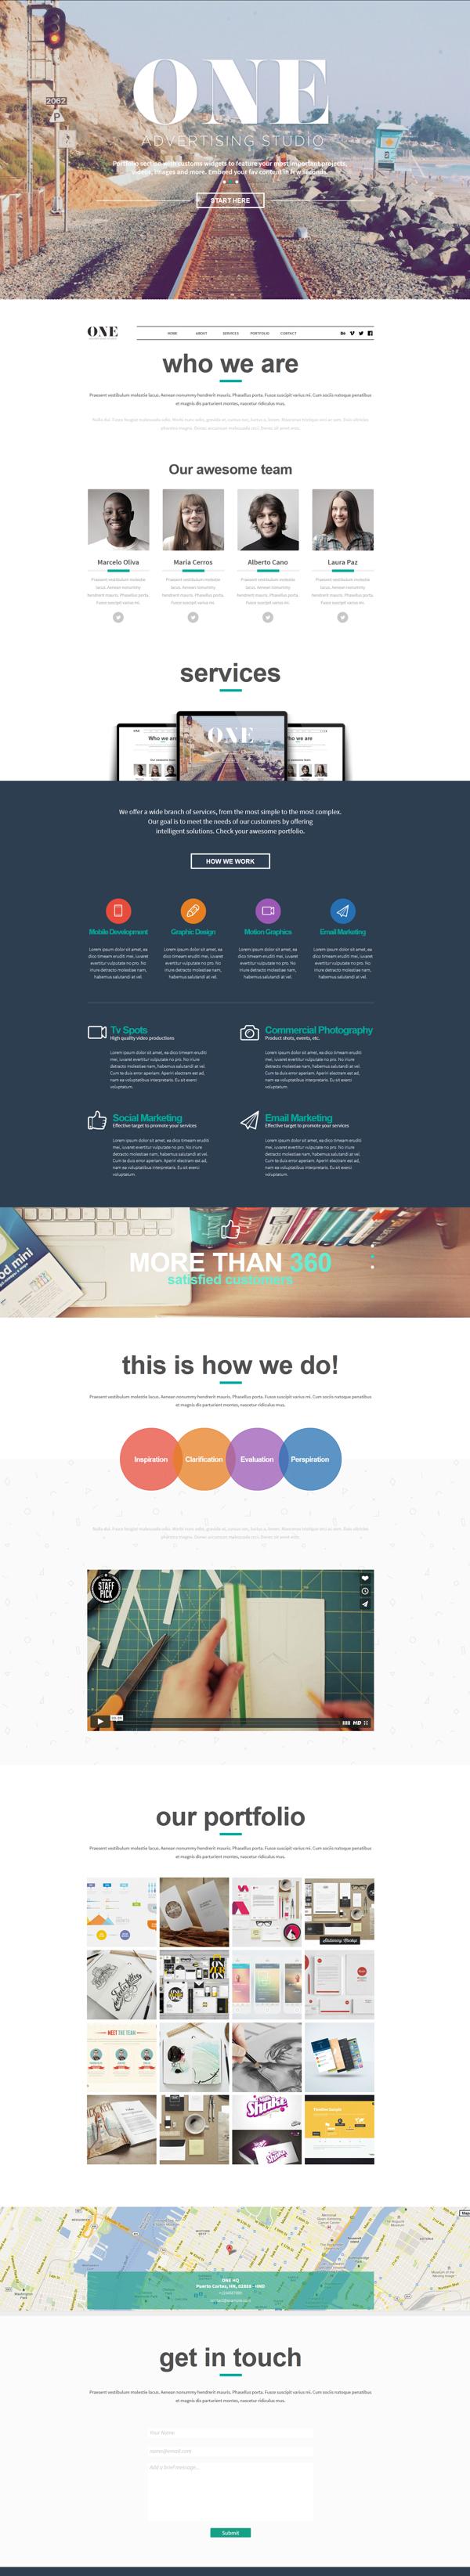 One Adobe Muse Theme By Eduardo Mejia Via Behance Web Layout Design Minimalist Web Design Web Design Examples